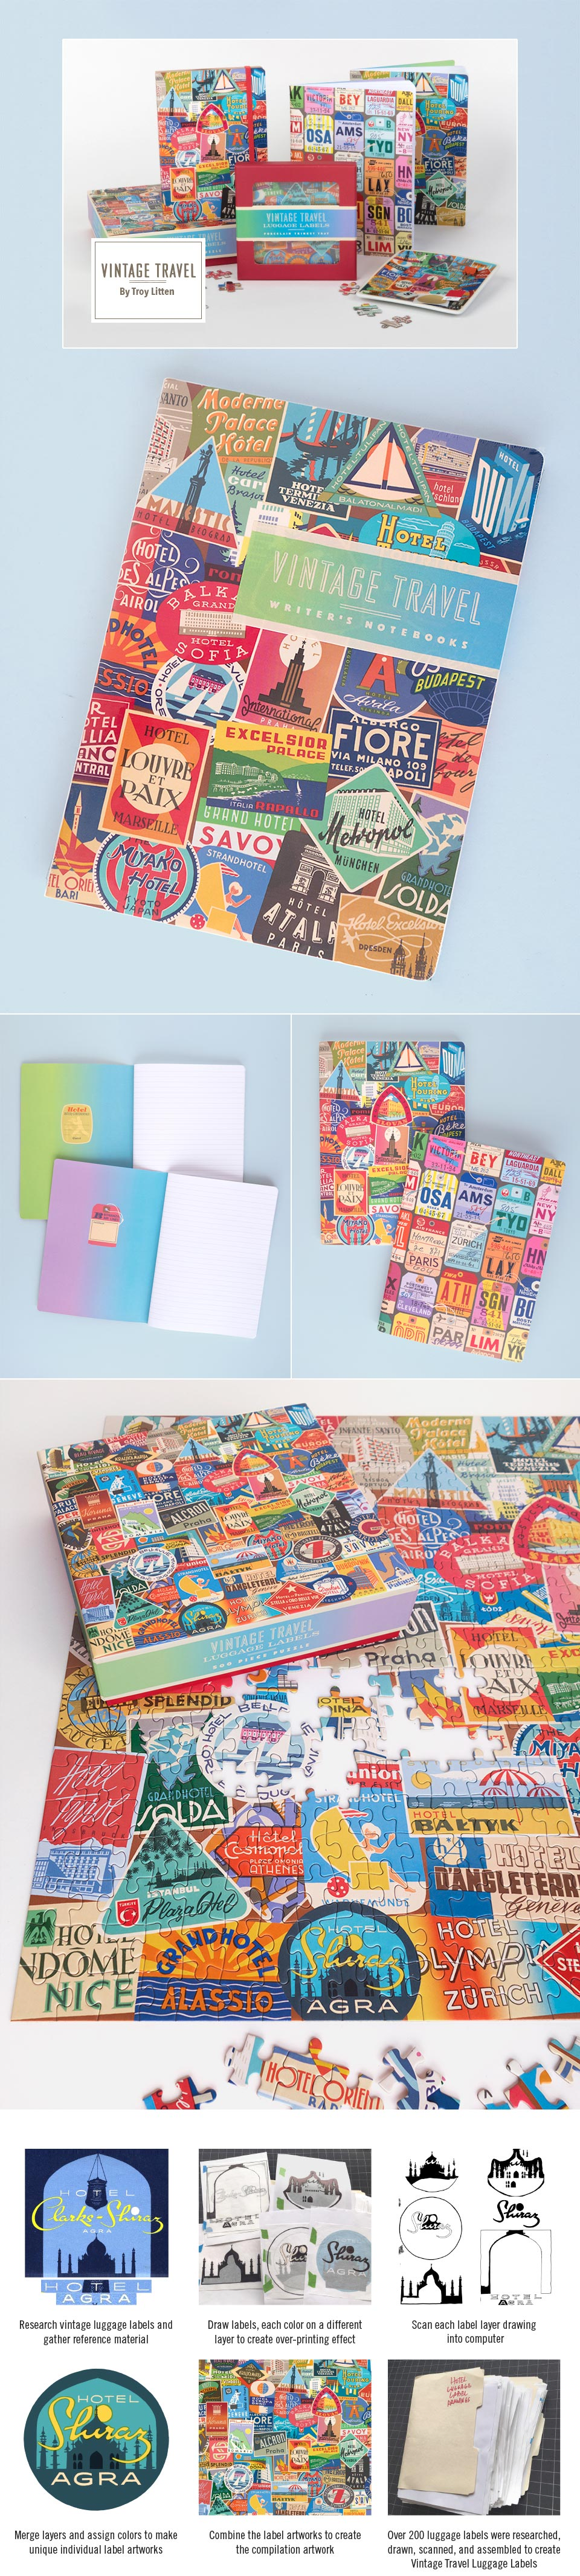 Notebook_ForWebsite_01_960_01.jpg